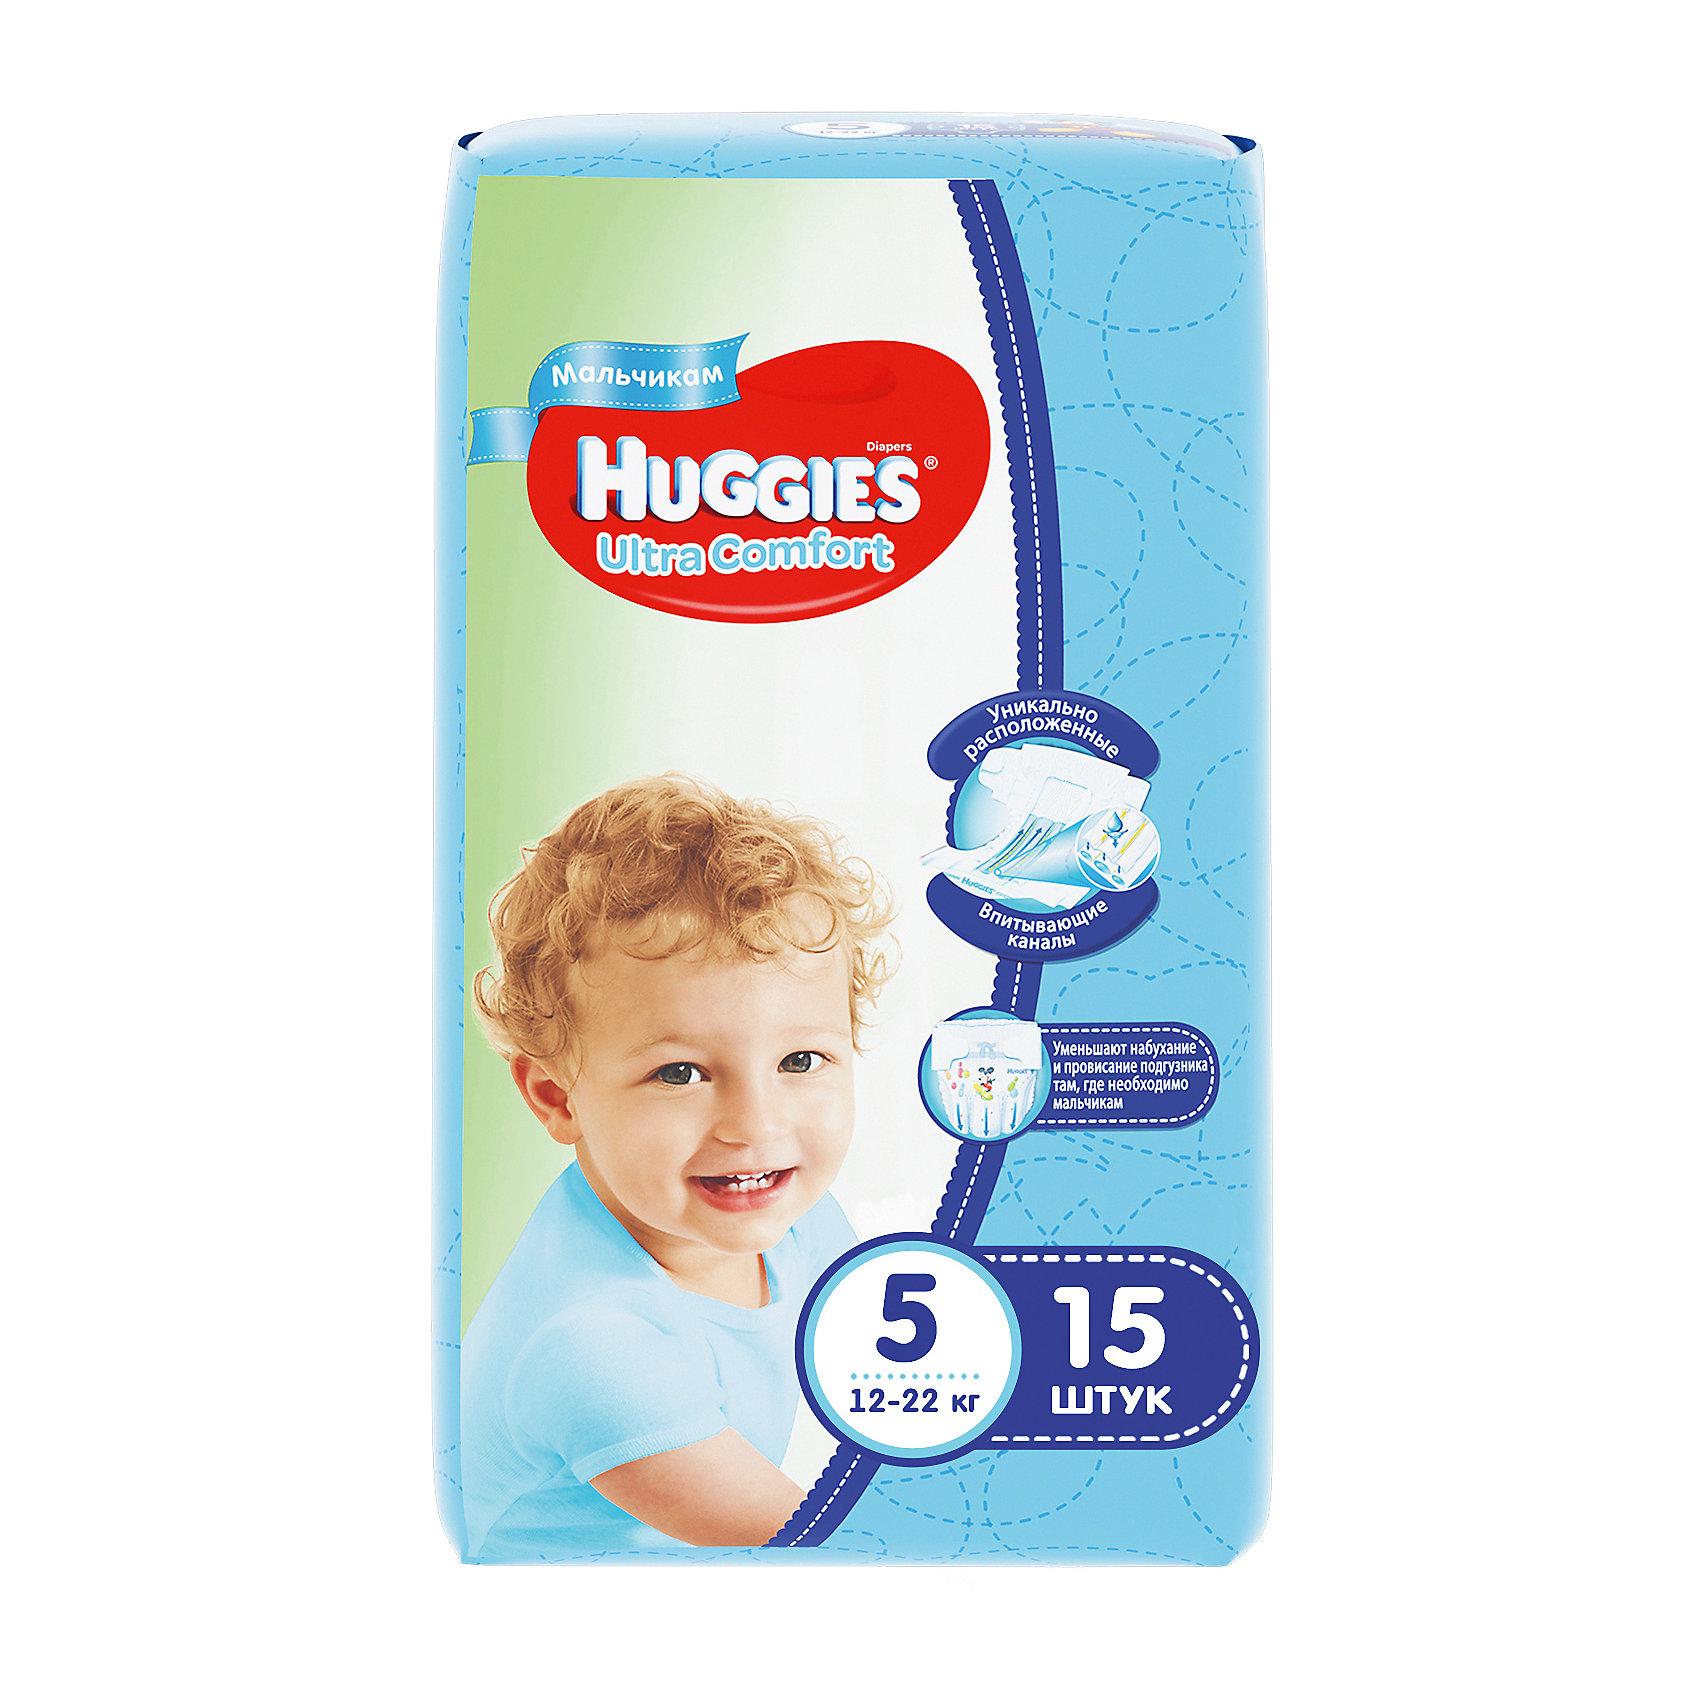 ���������� Huggies Ultra Comfort ��� ��������� (5) 12-22 ��, 15 ��. (HUGGIES)